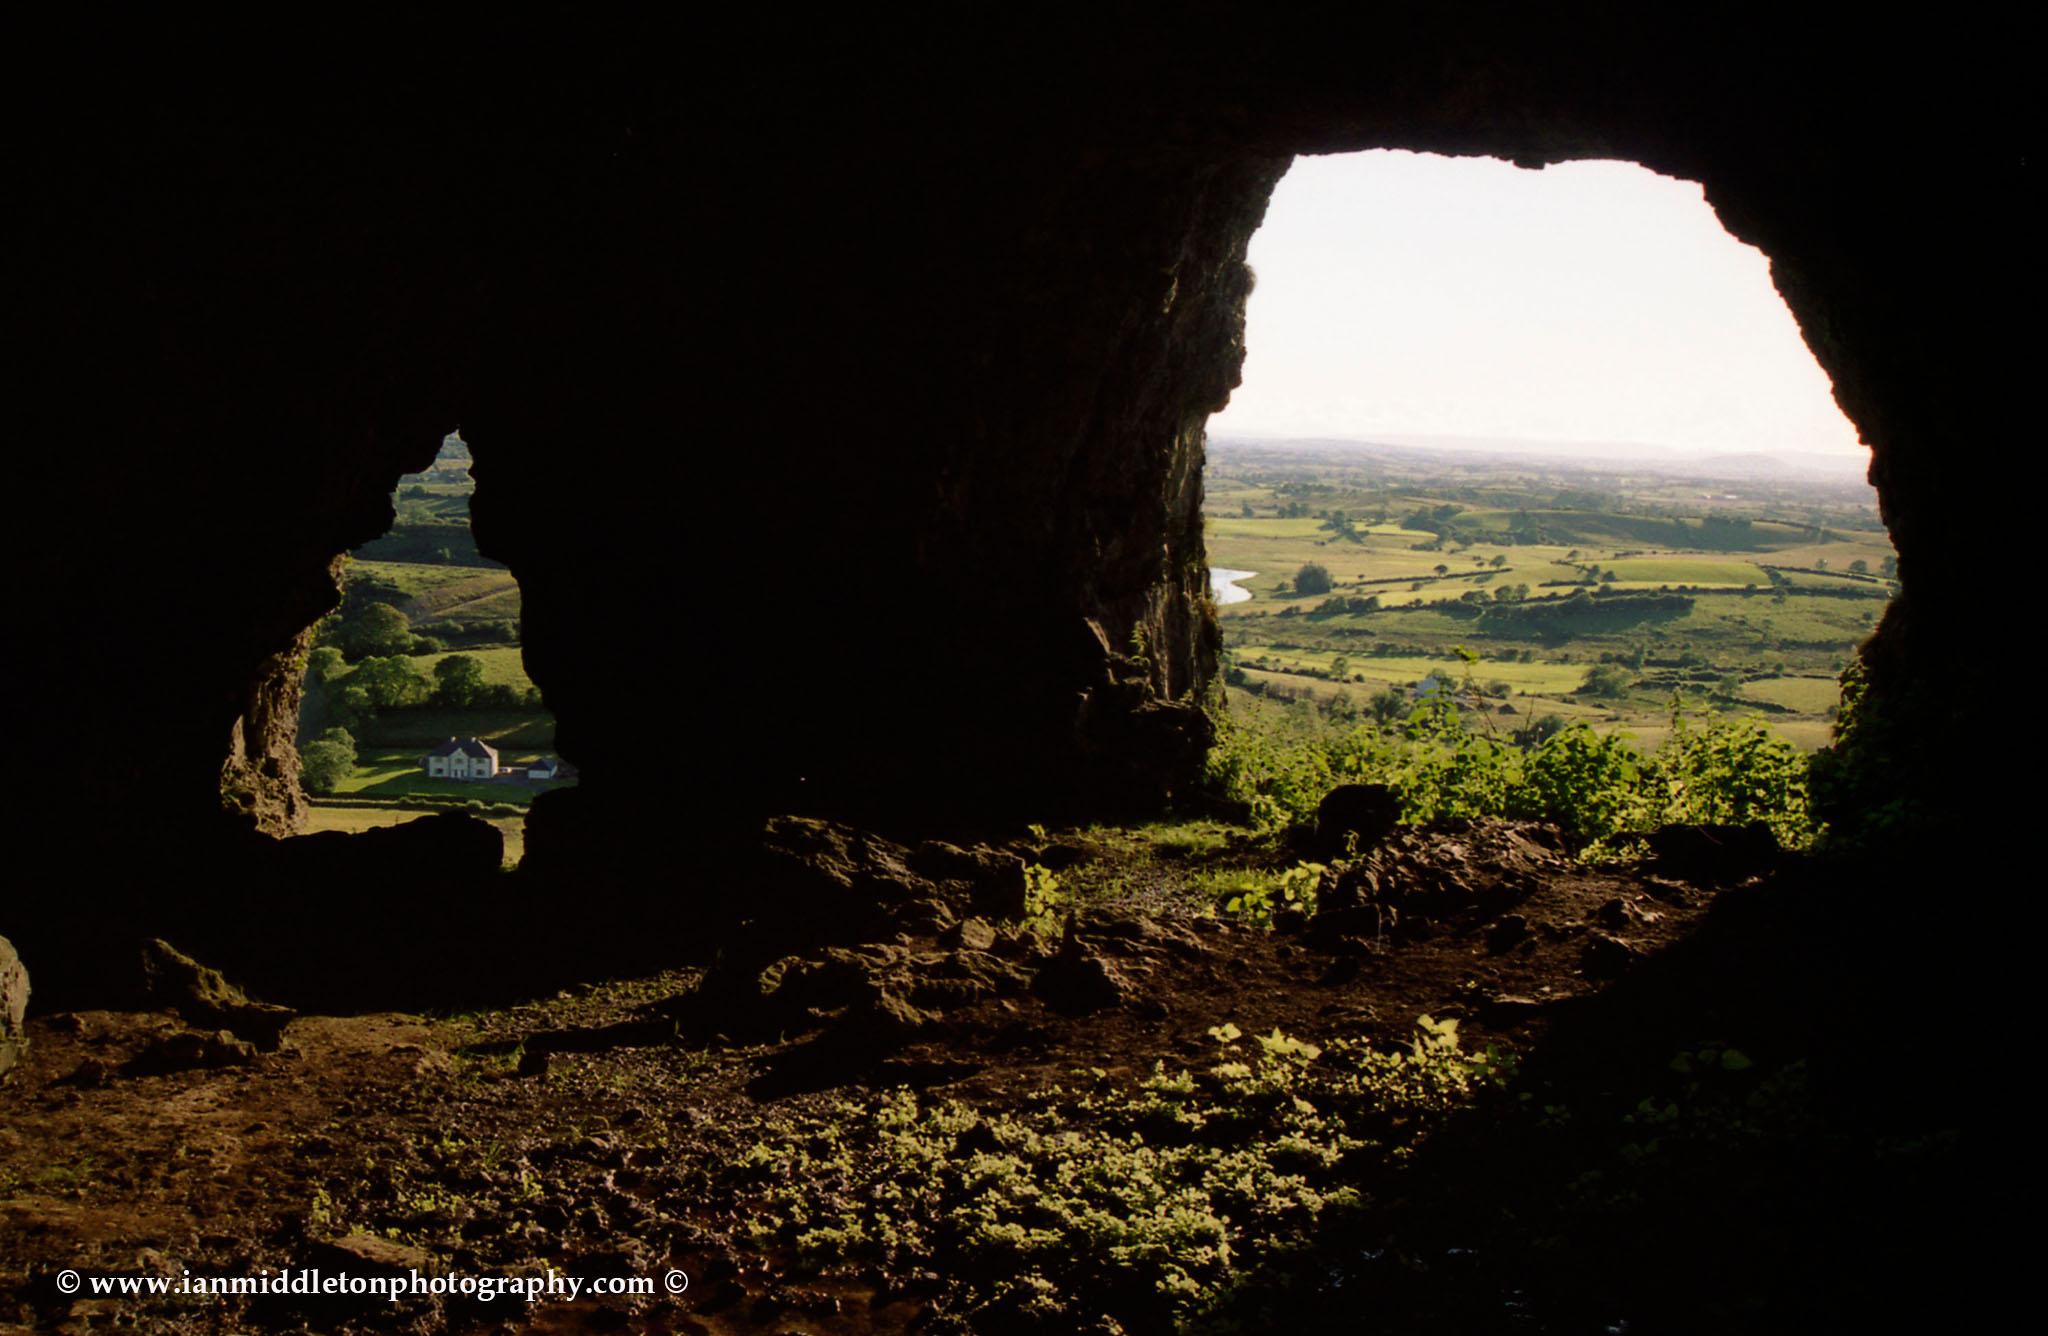 Keshcorran Caves in County Sligo, North West Ireland.